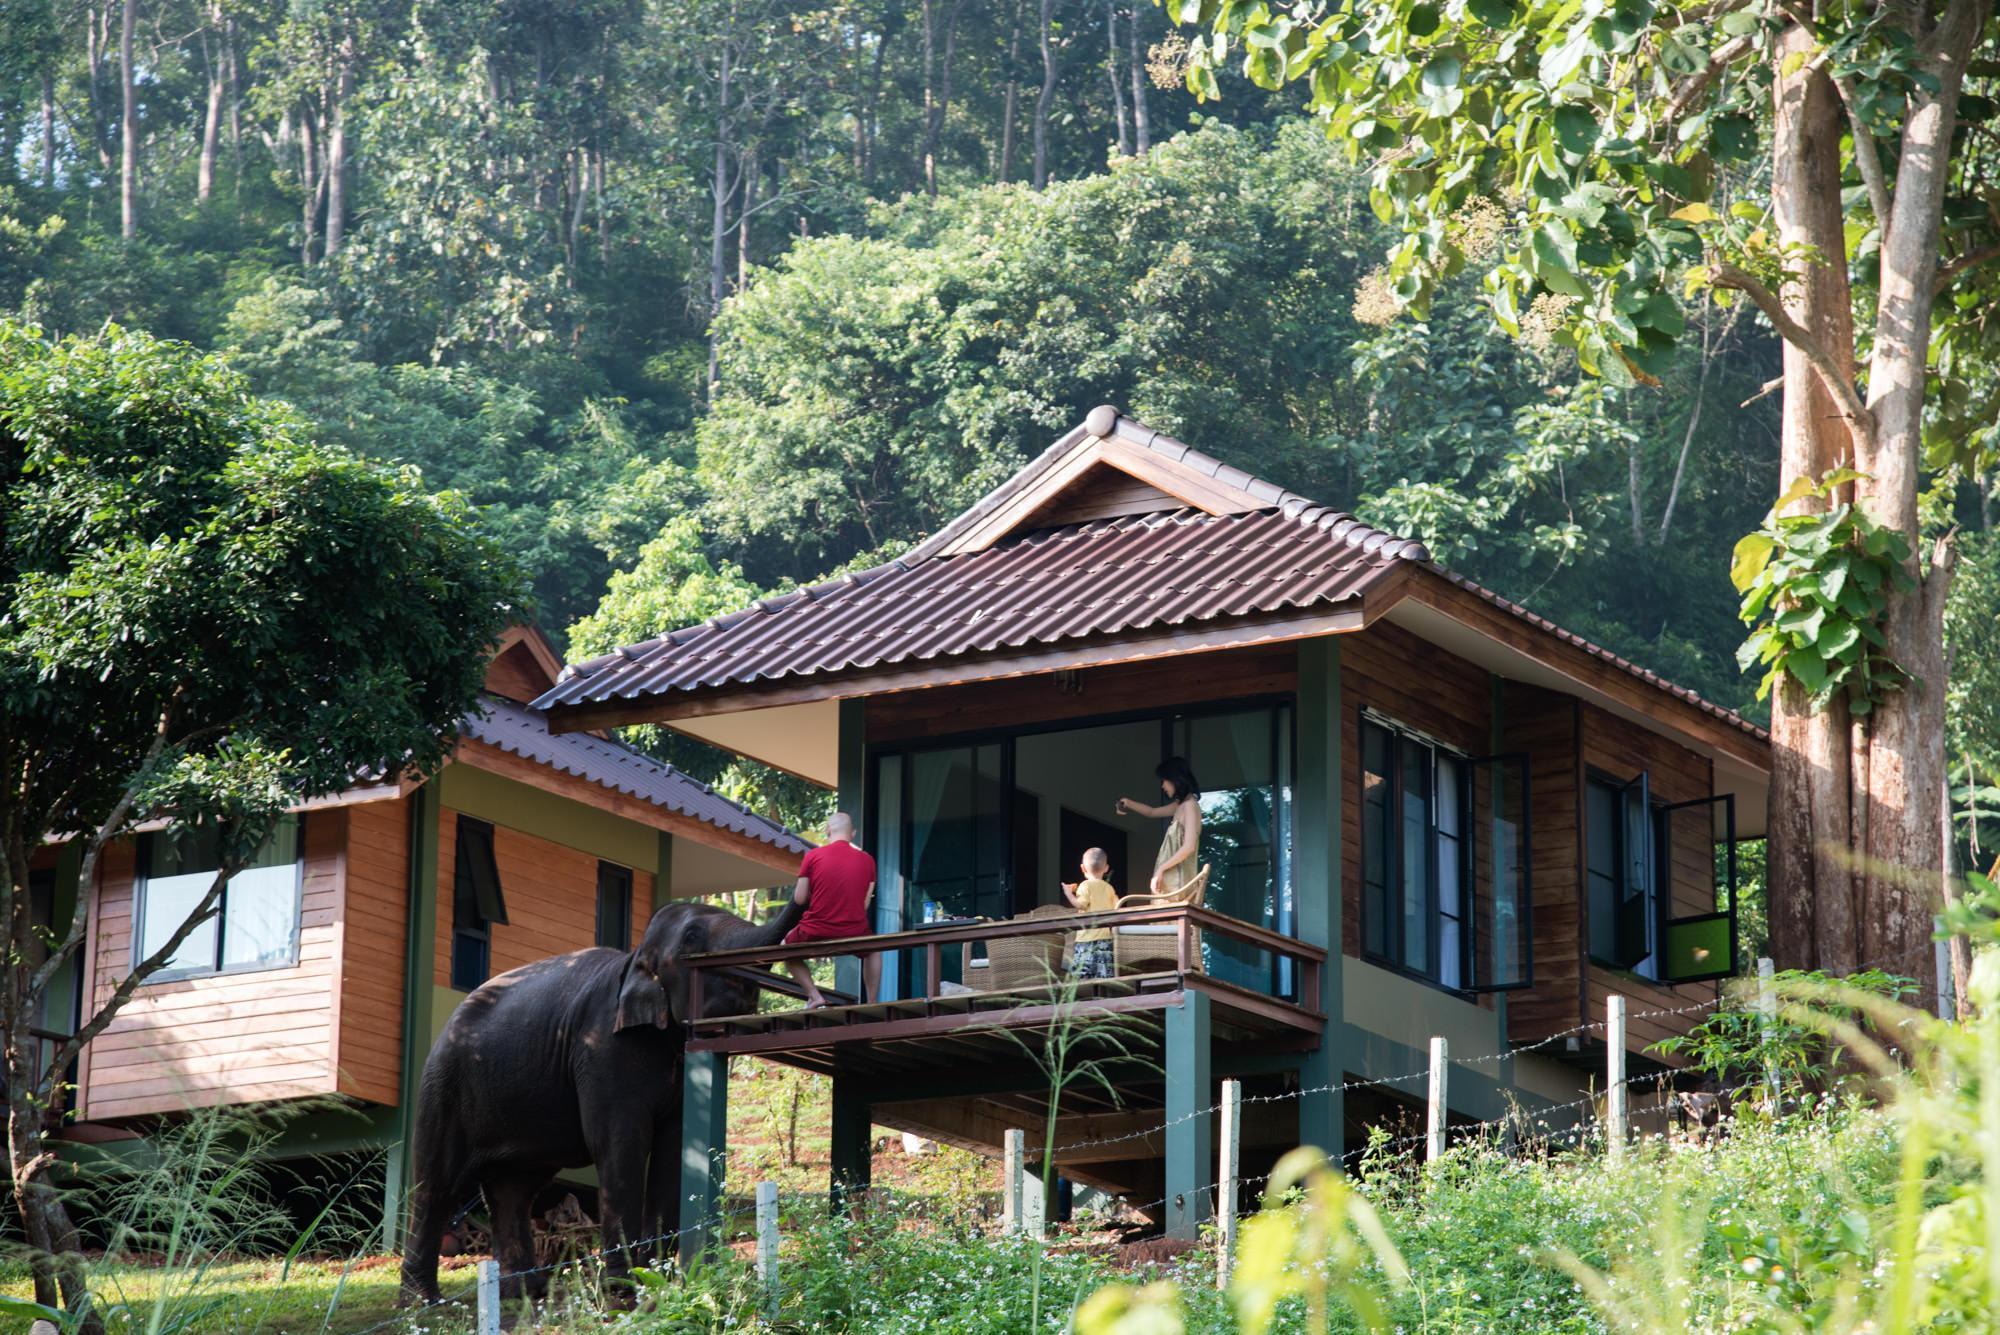 Chiang Mai Elephant Friends